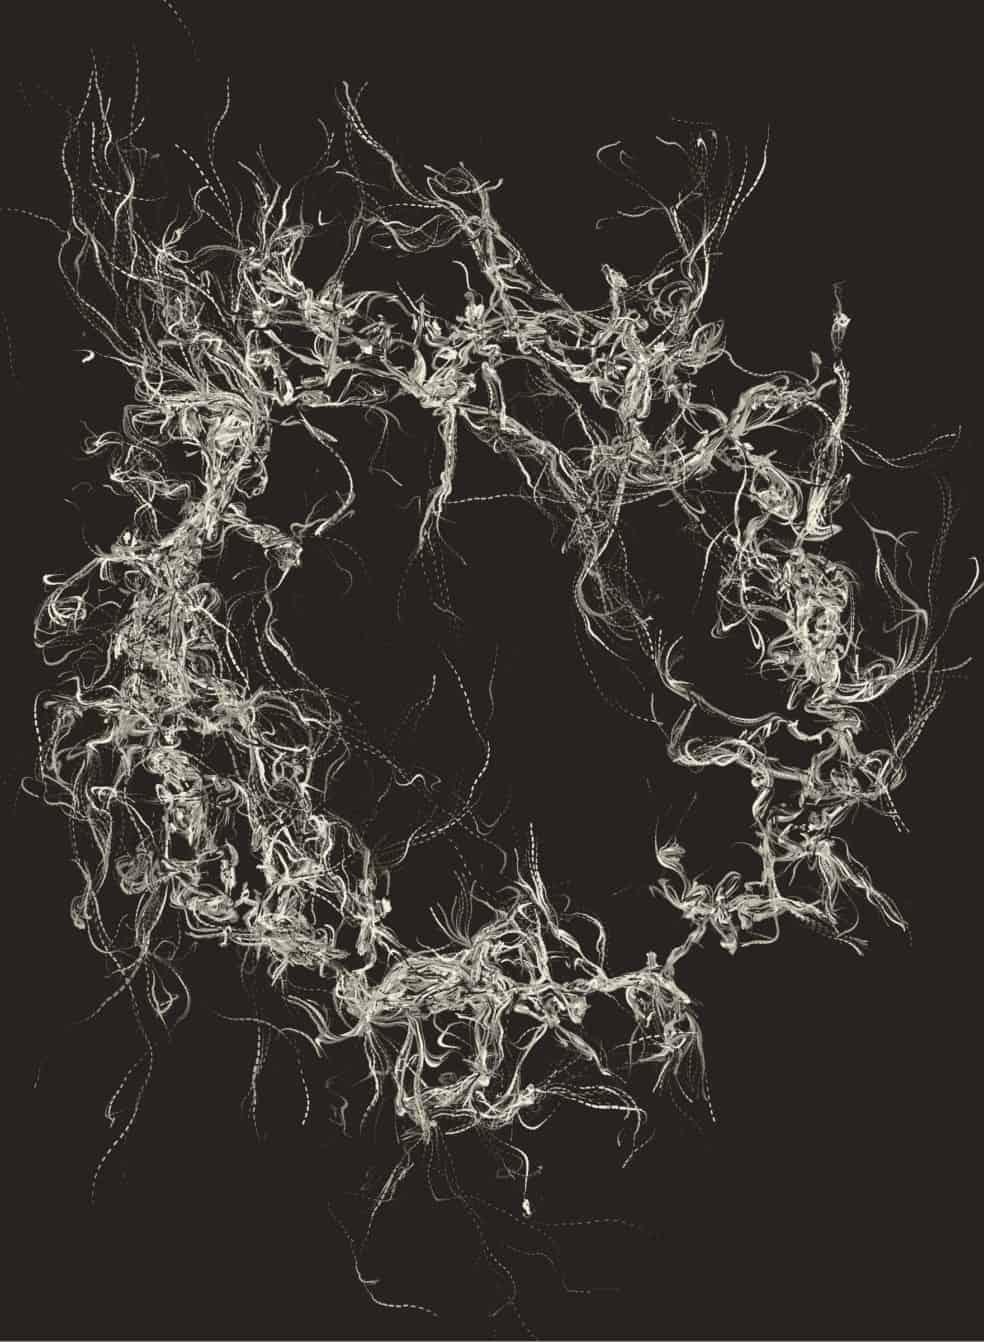 FLow Fiel Generative art javascript 06